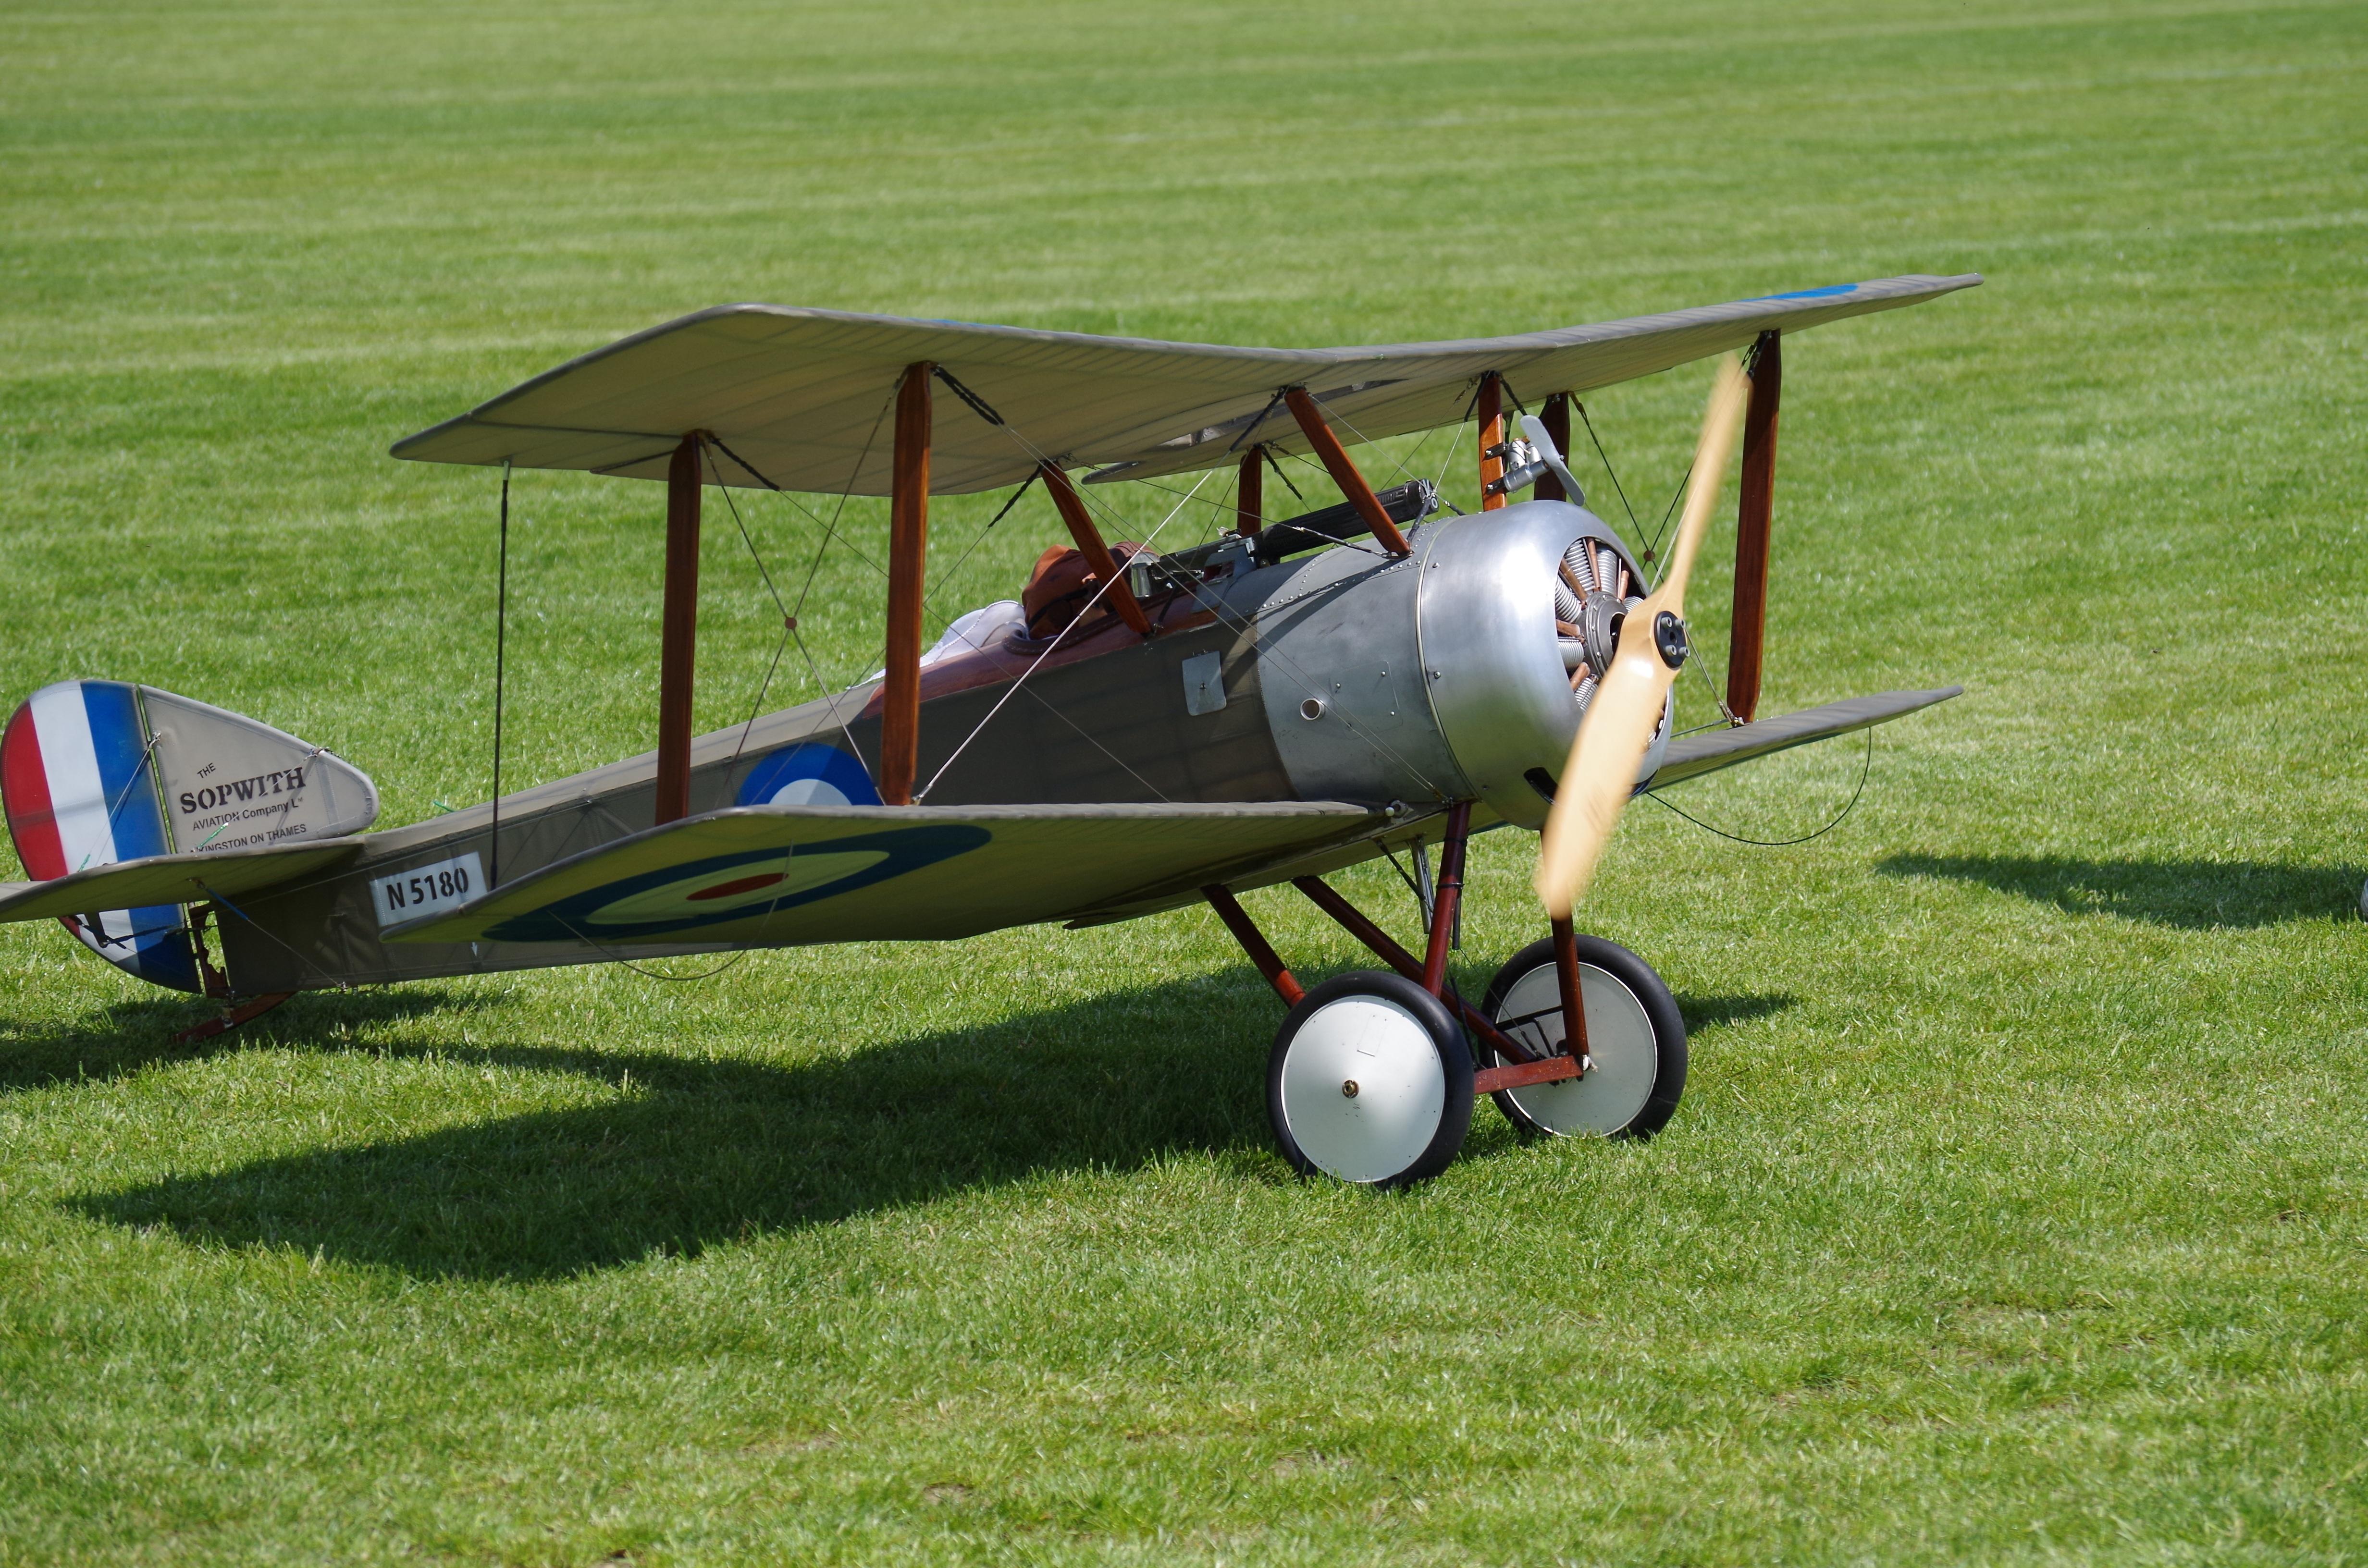 Free Images : land, airplane, vehicle, flight, biplane, fighter